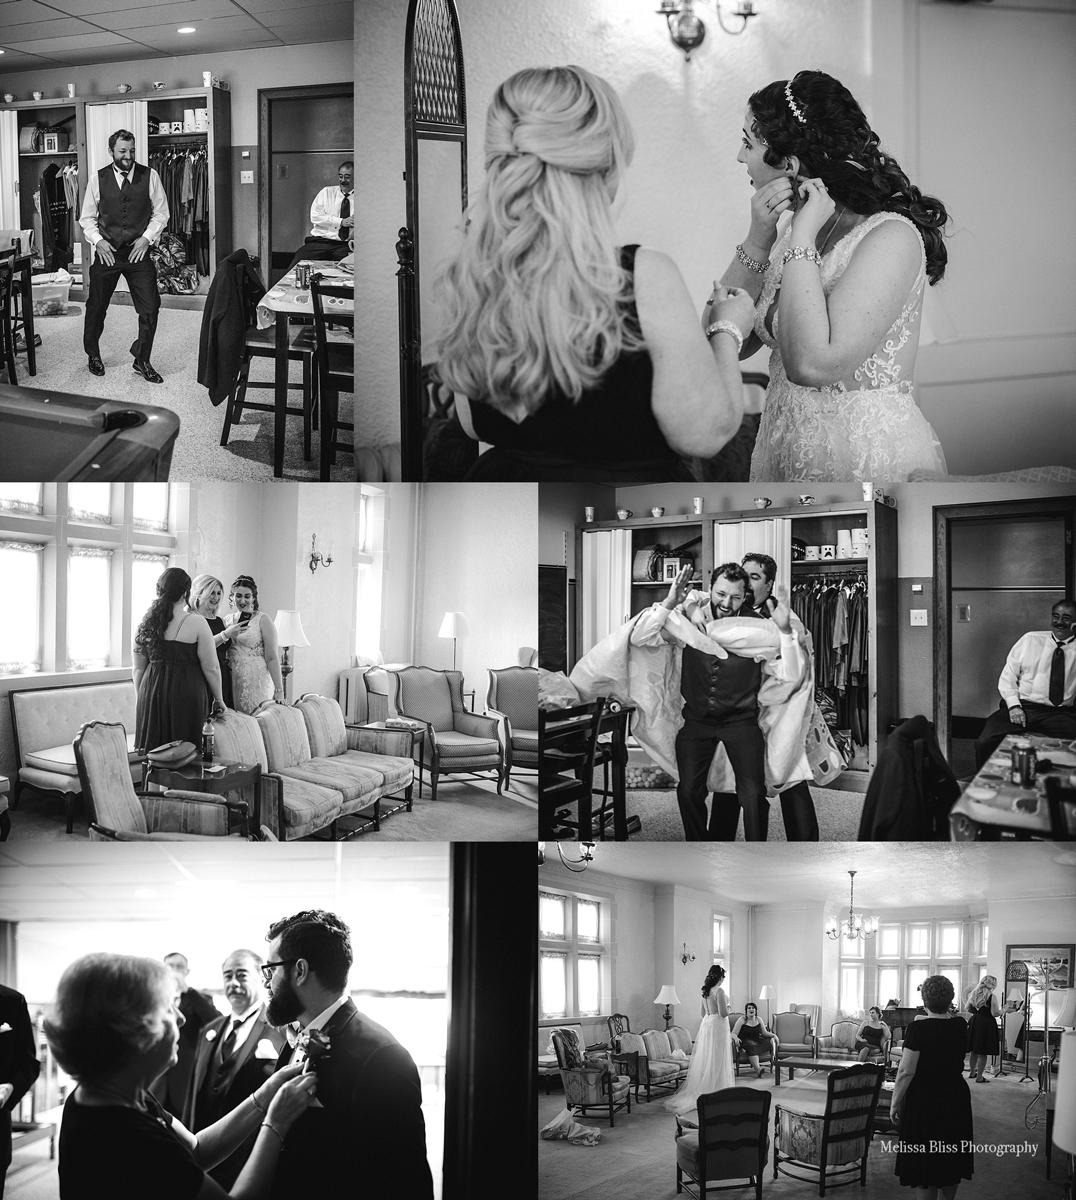 williamsburg-wedding-photographer-melissa-bliss-photography-desination-wedding-photos-va-wedding-photographer.jpg